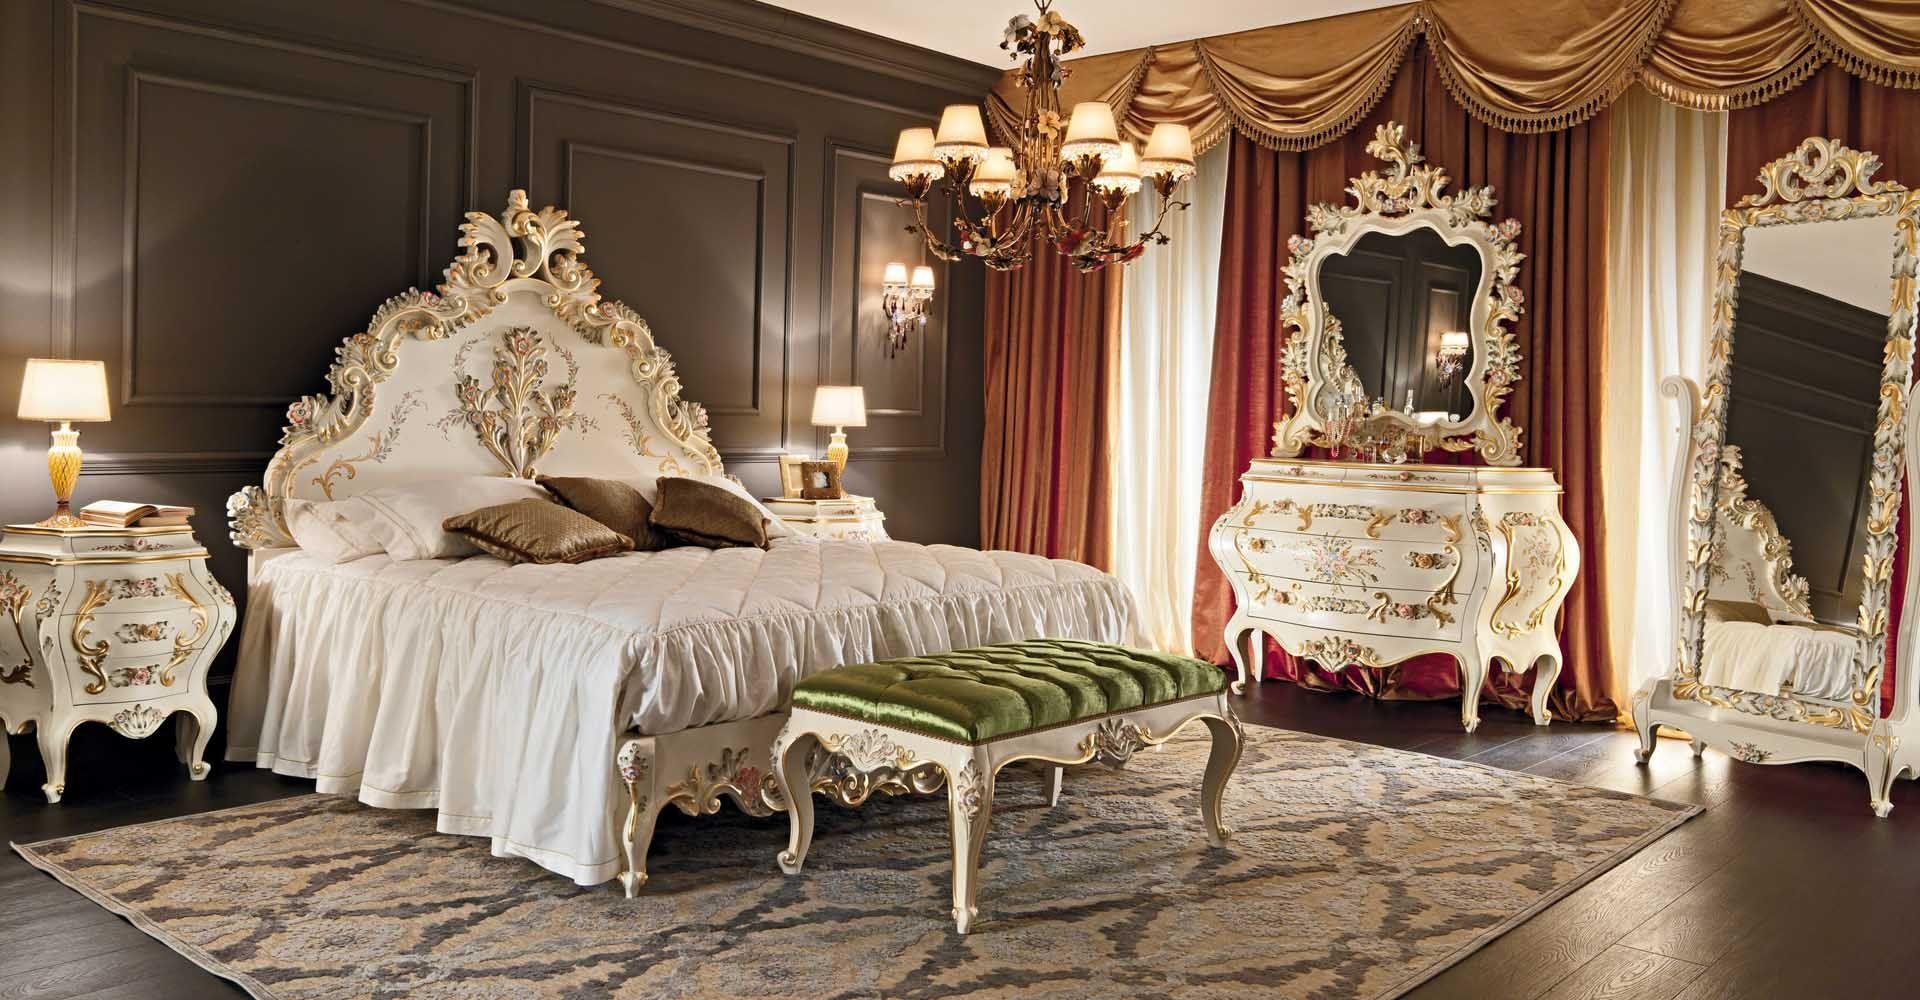 Italian bedroom decor - Furniture Luxury Bedroom Set Luxury Bedroom Set Luxury Bedroom Set Design 16001067 Luxury Bedroom Set